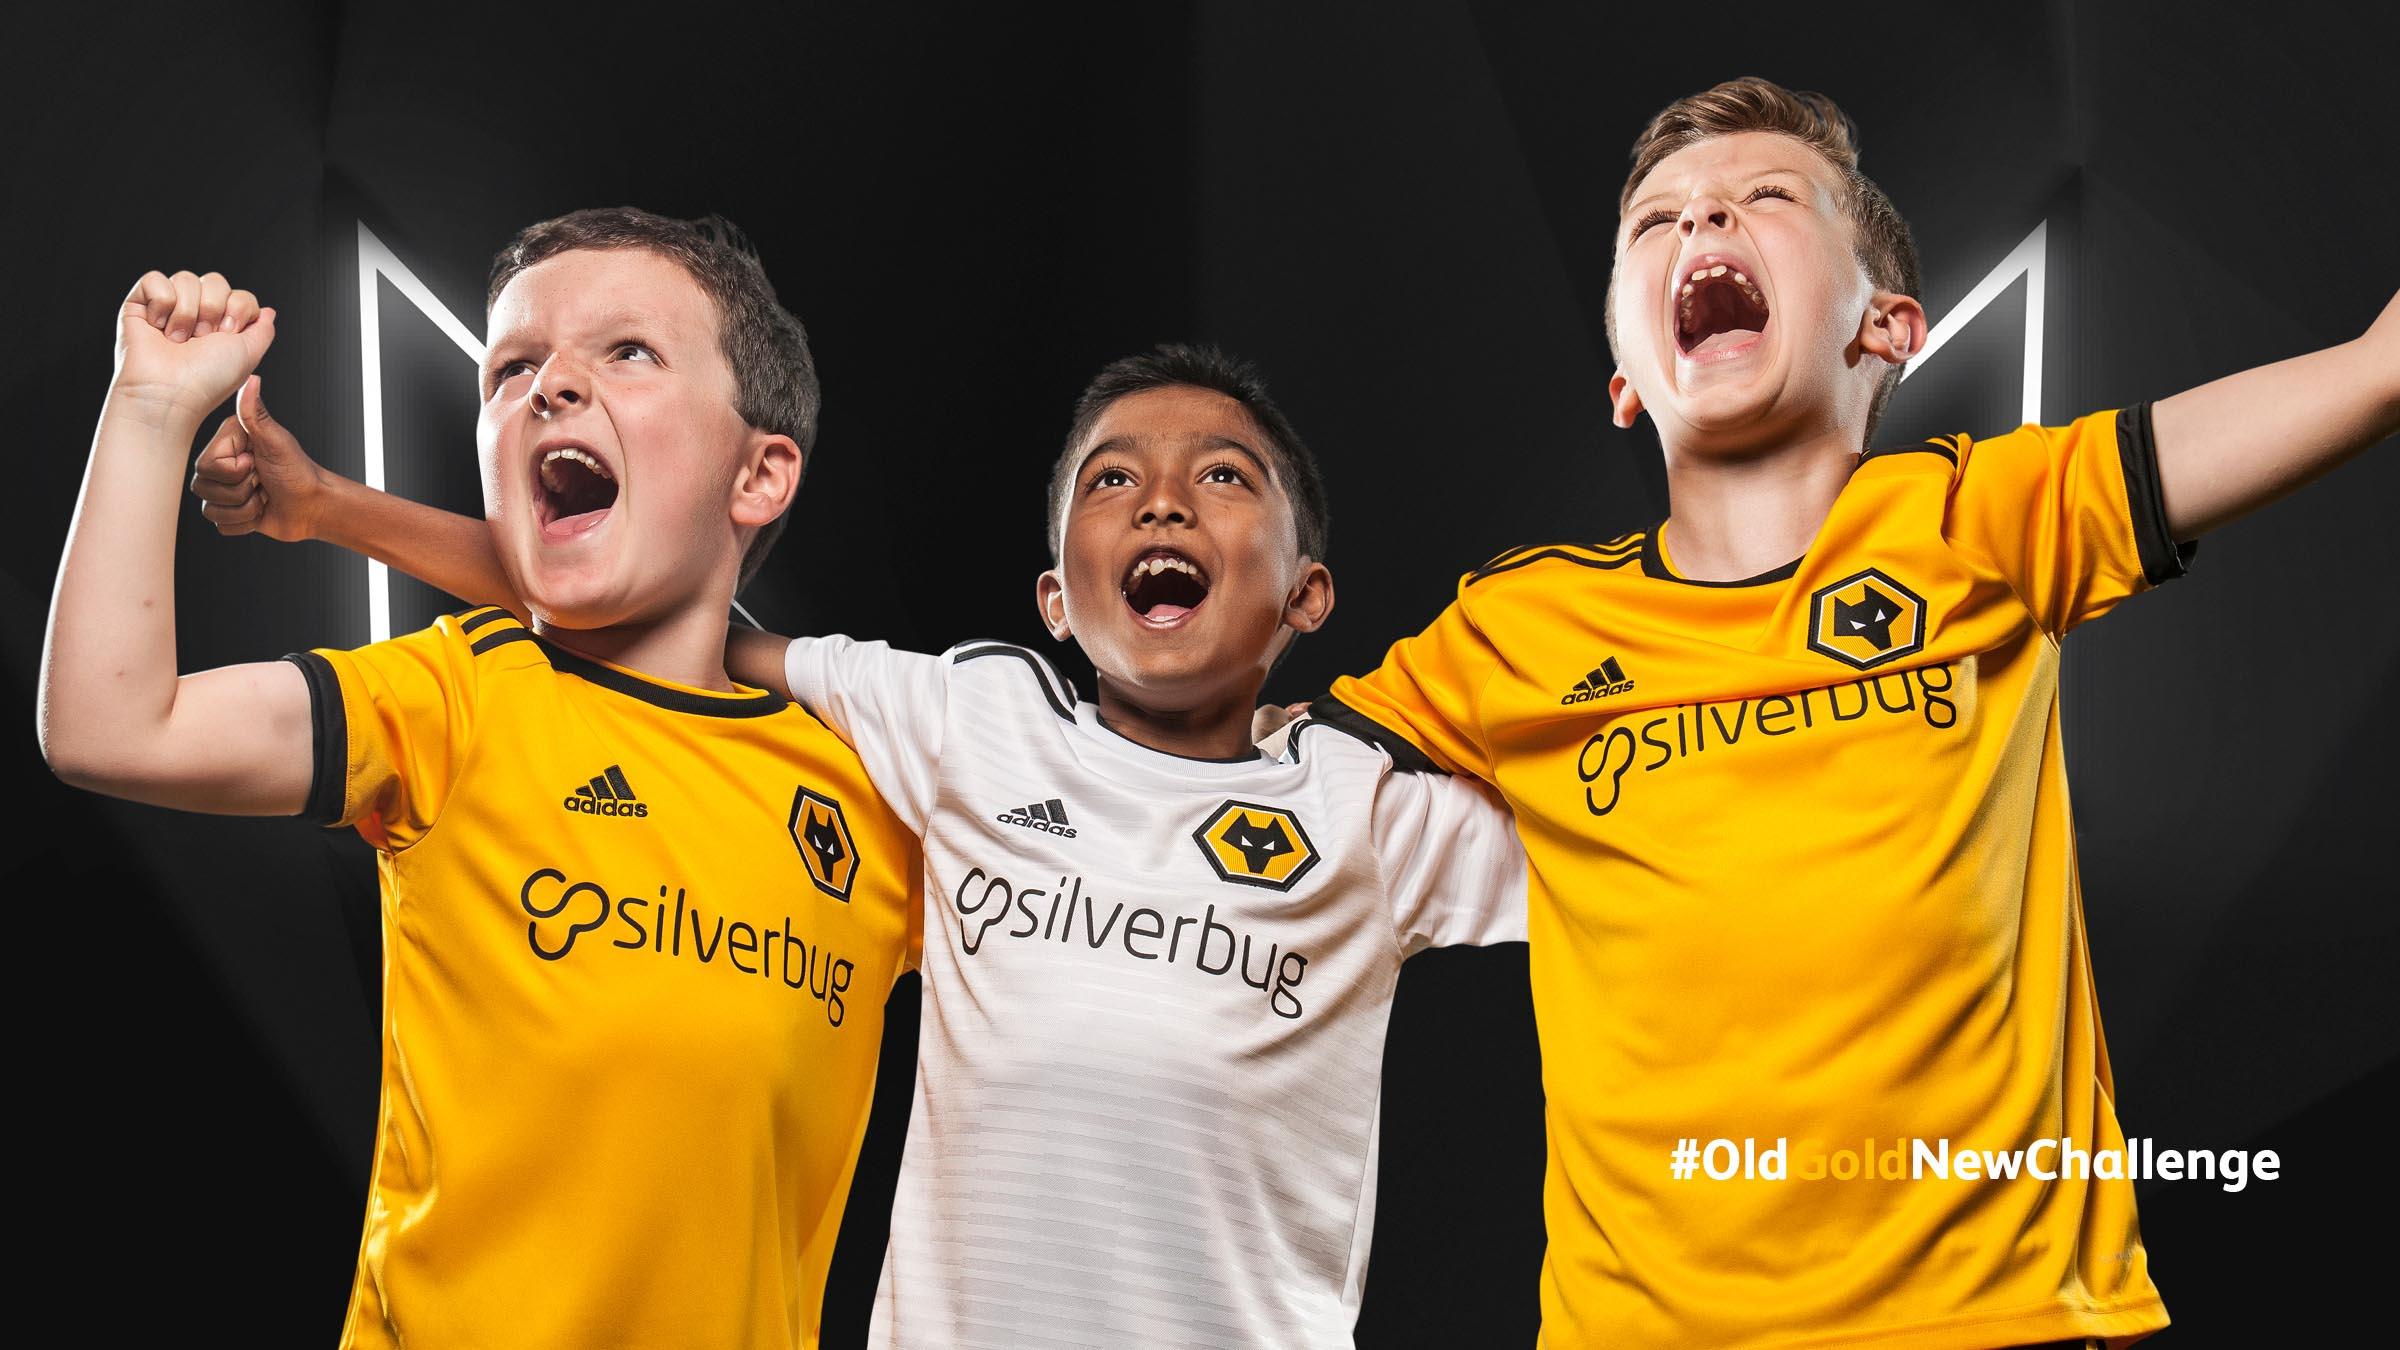 Old Gold, New Challenge | Wolverhampton Wanderers FC